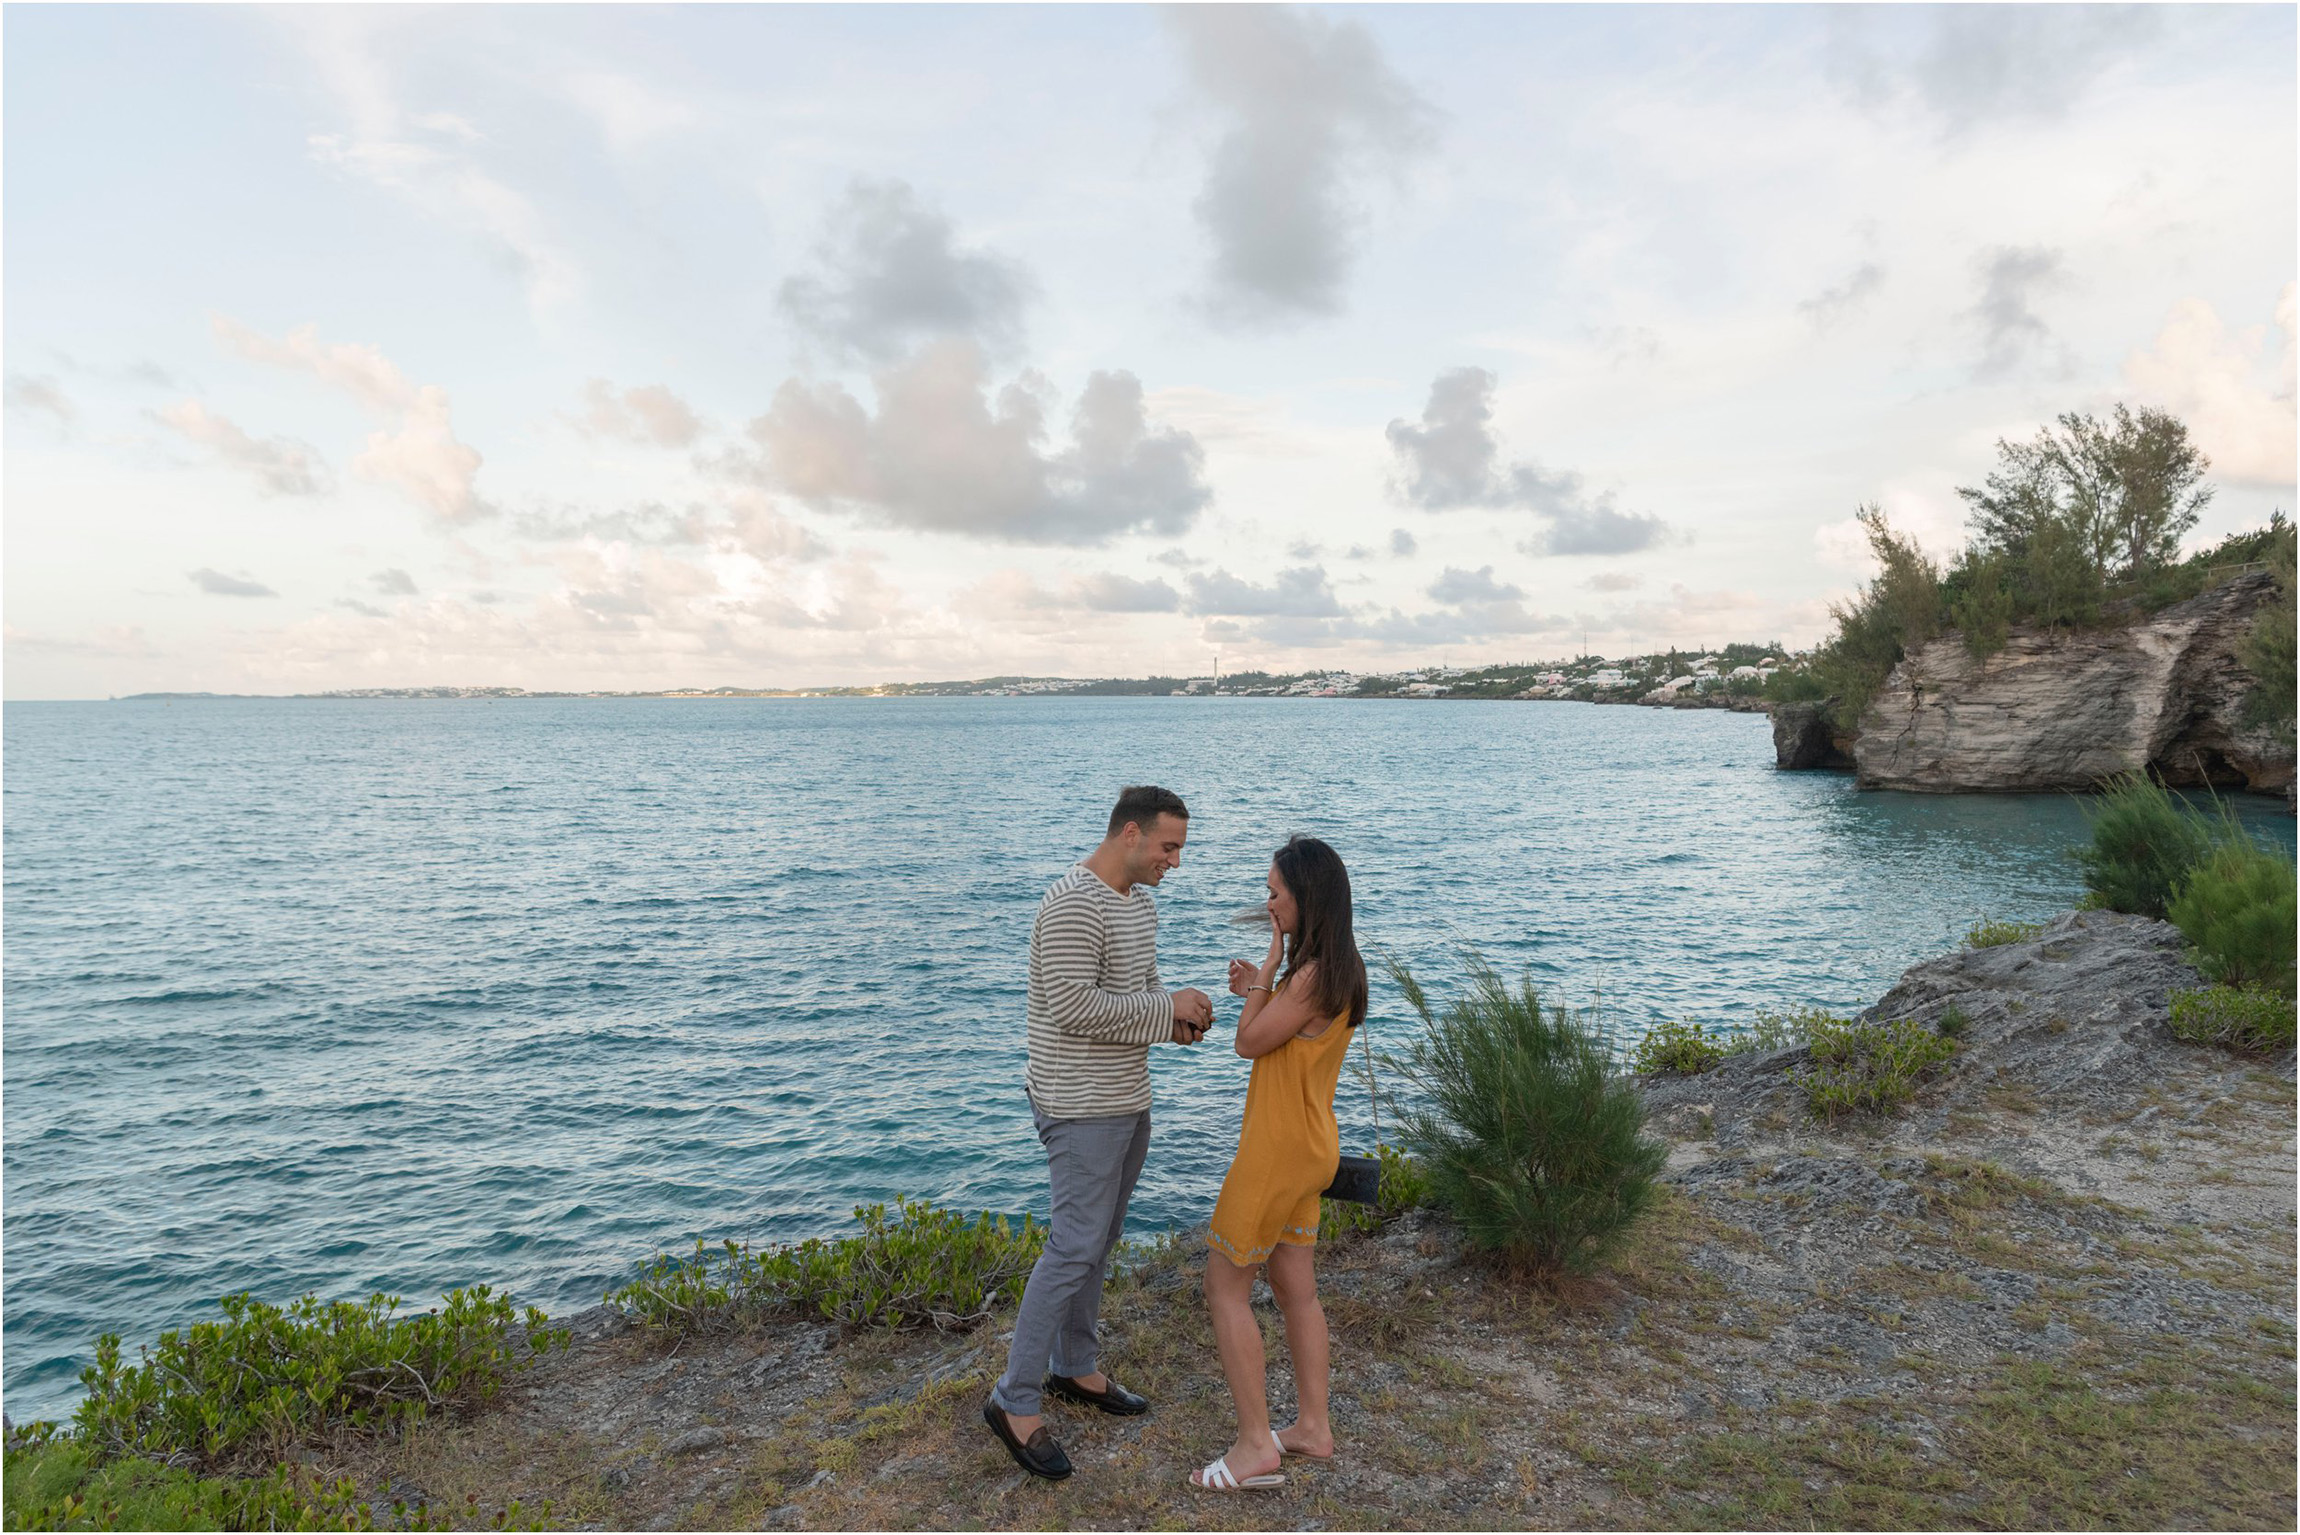 ©FianderFoto_Proposal Photographer_Bermuda_Admiralty House_Kresnick_Rina_004.jpg